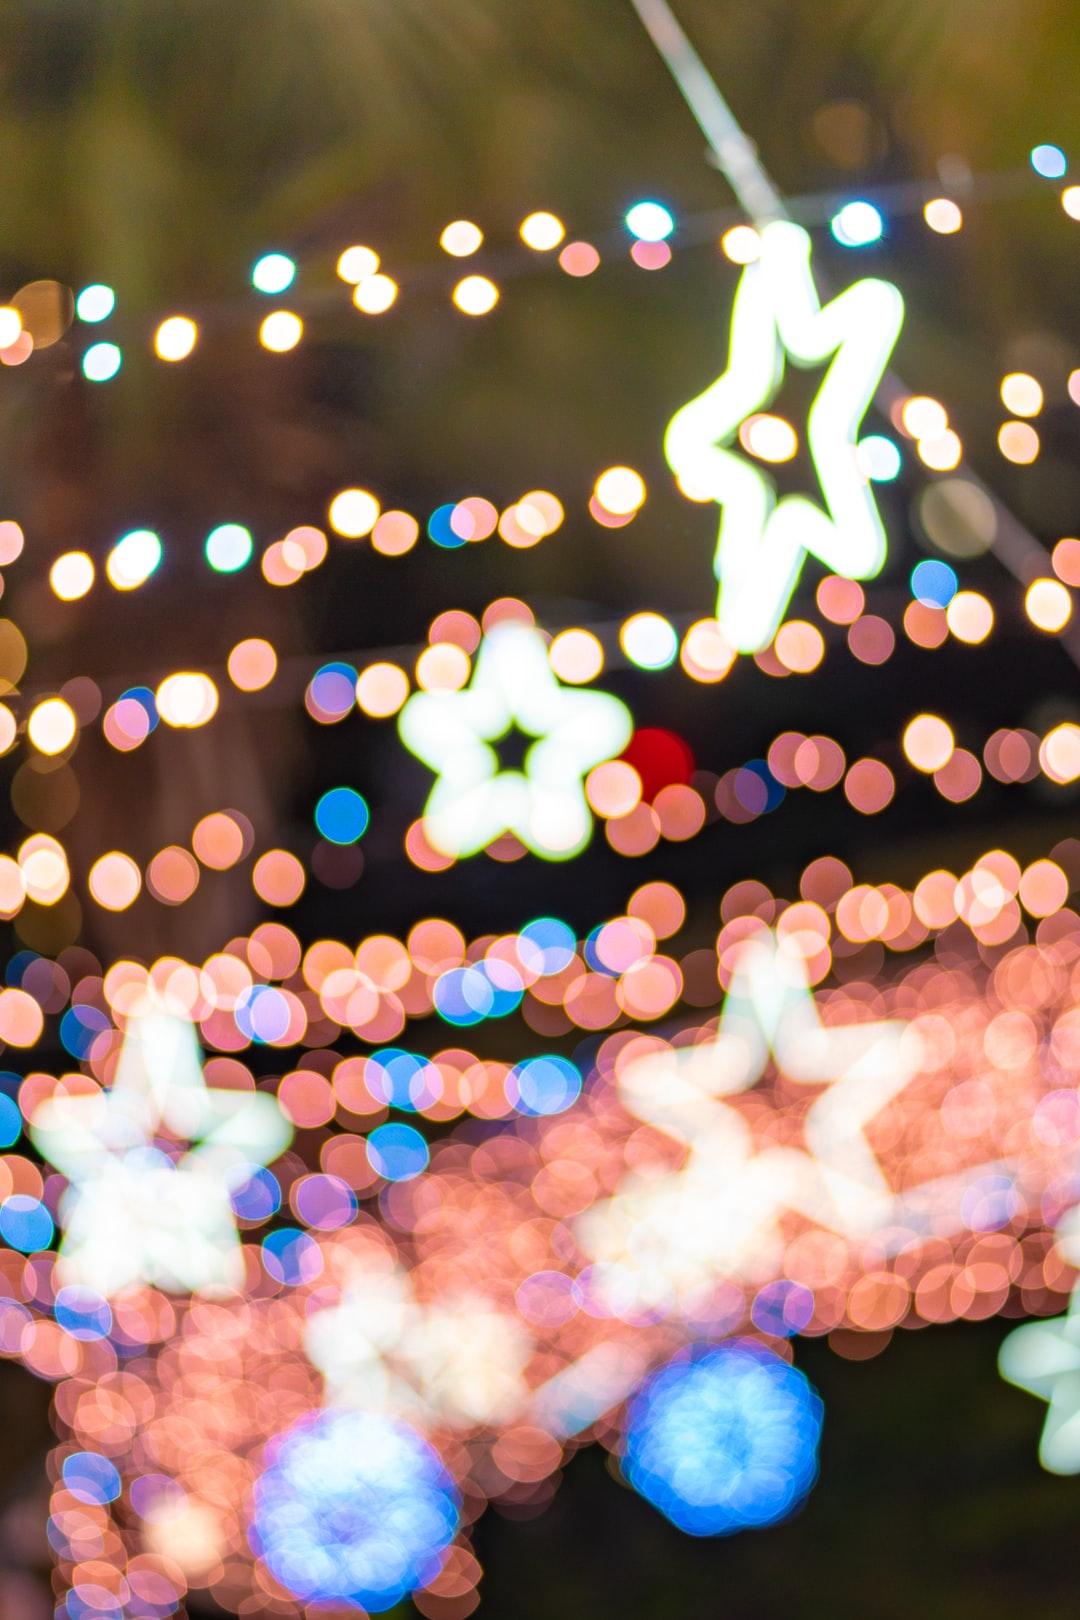 2018 Christmasland in New Taipei City